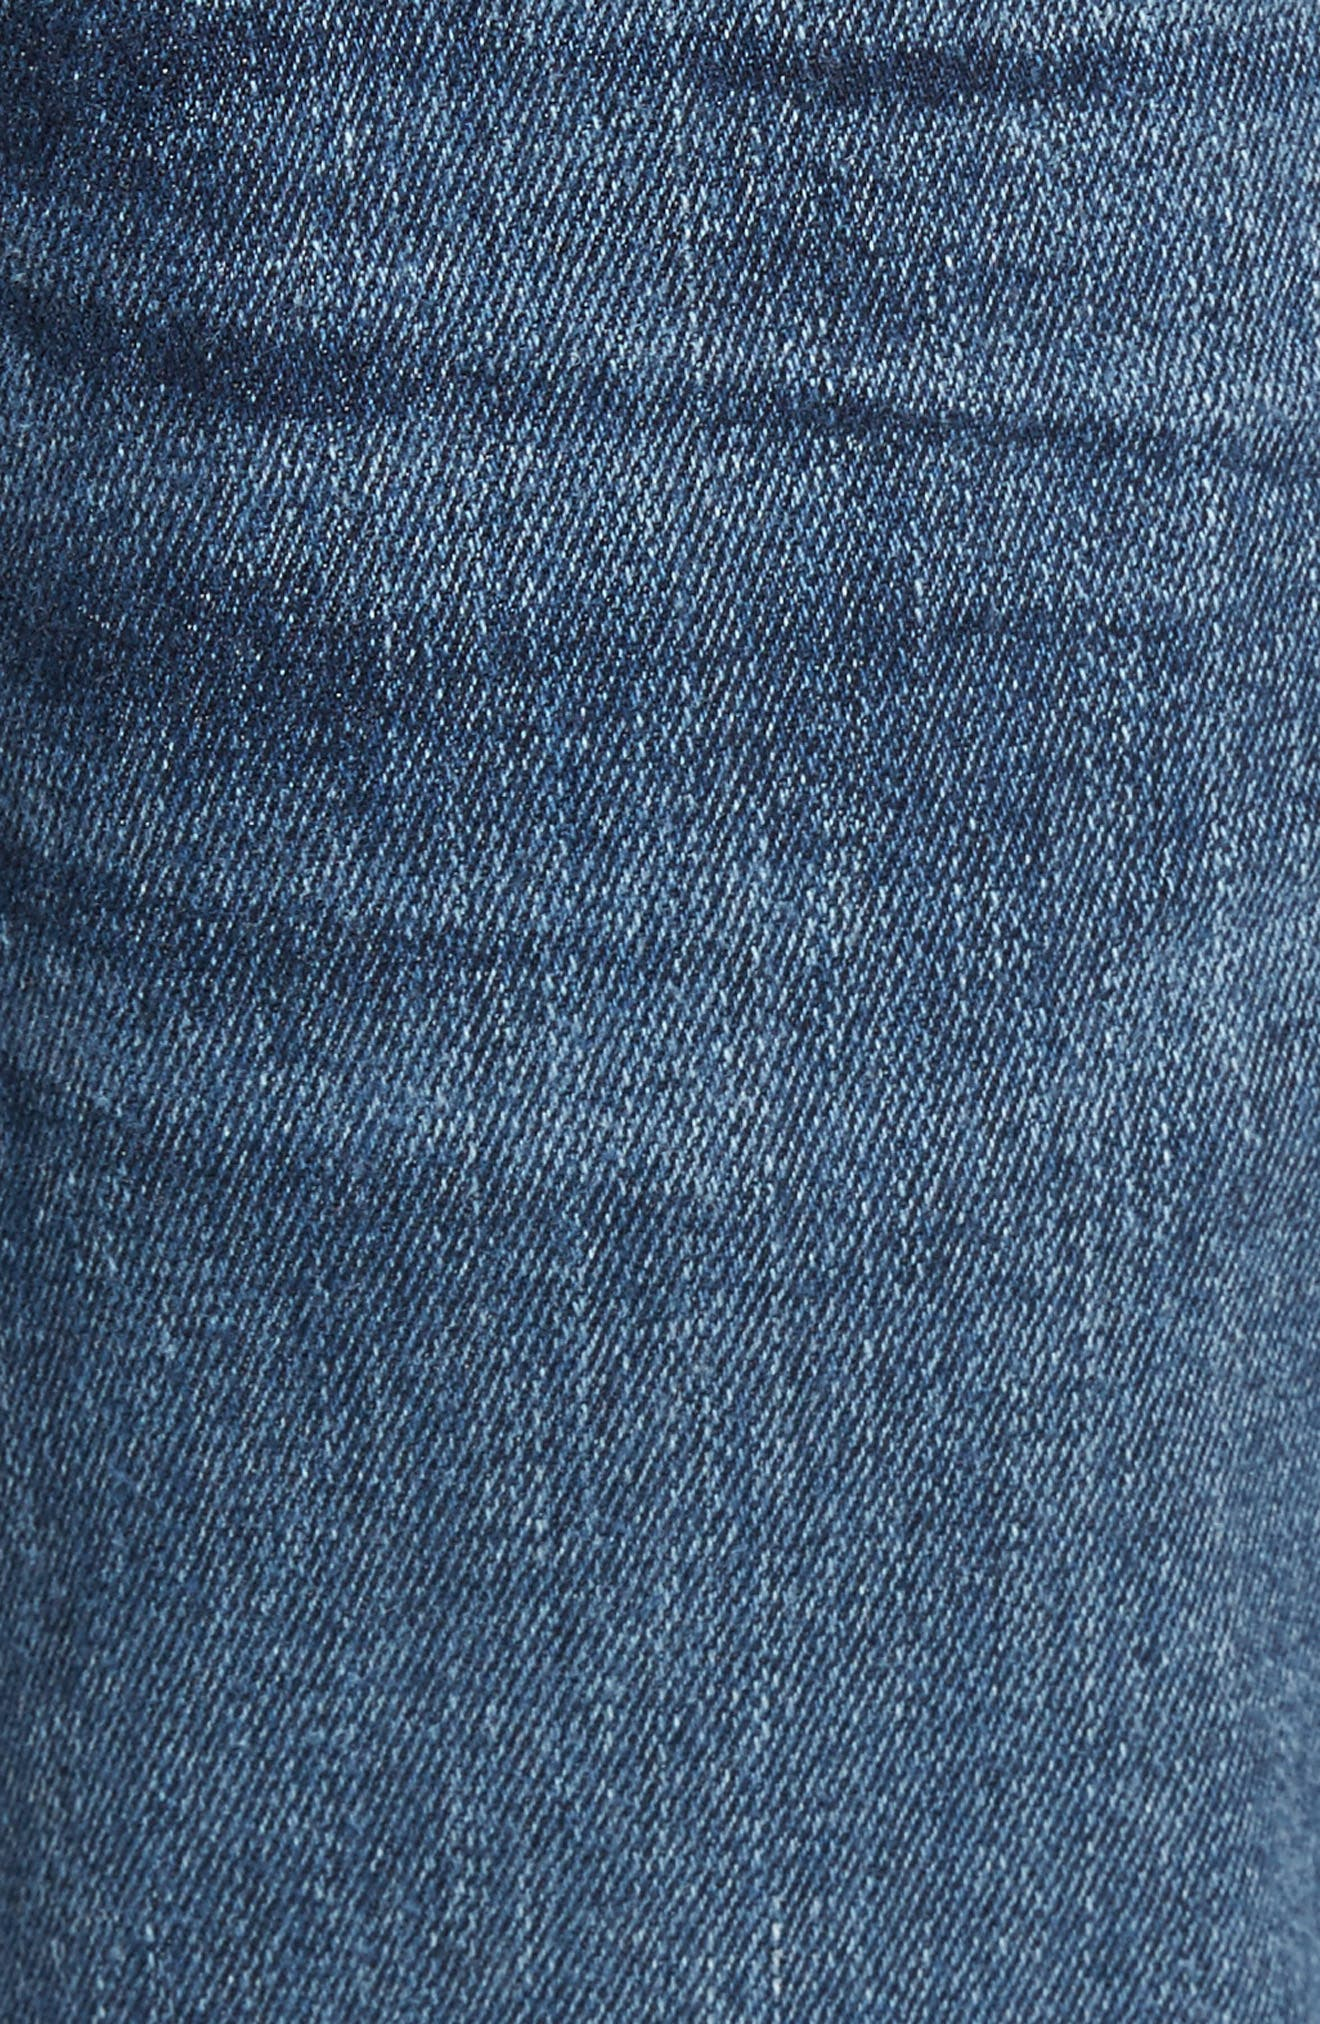 Blake Slim Fit Jeans,                             Alternate thumbnail 5, color,                             Calloway